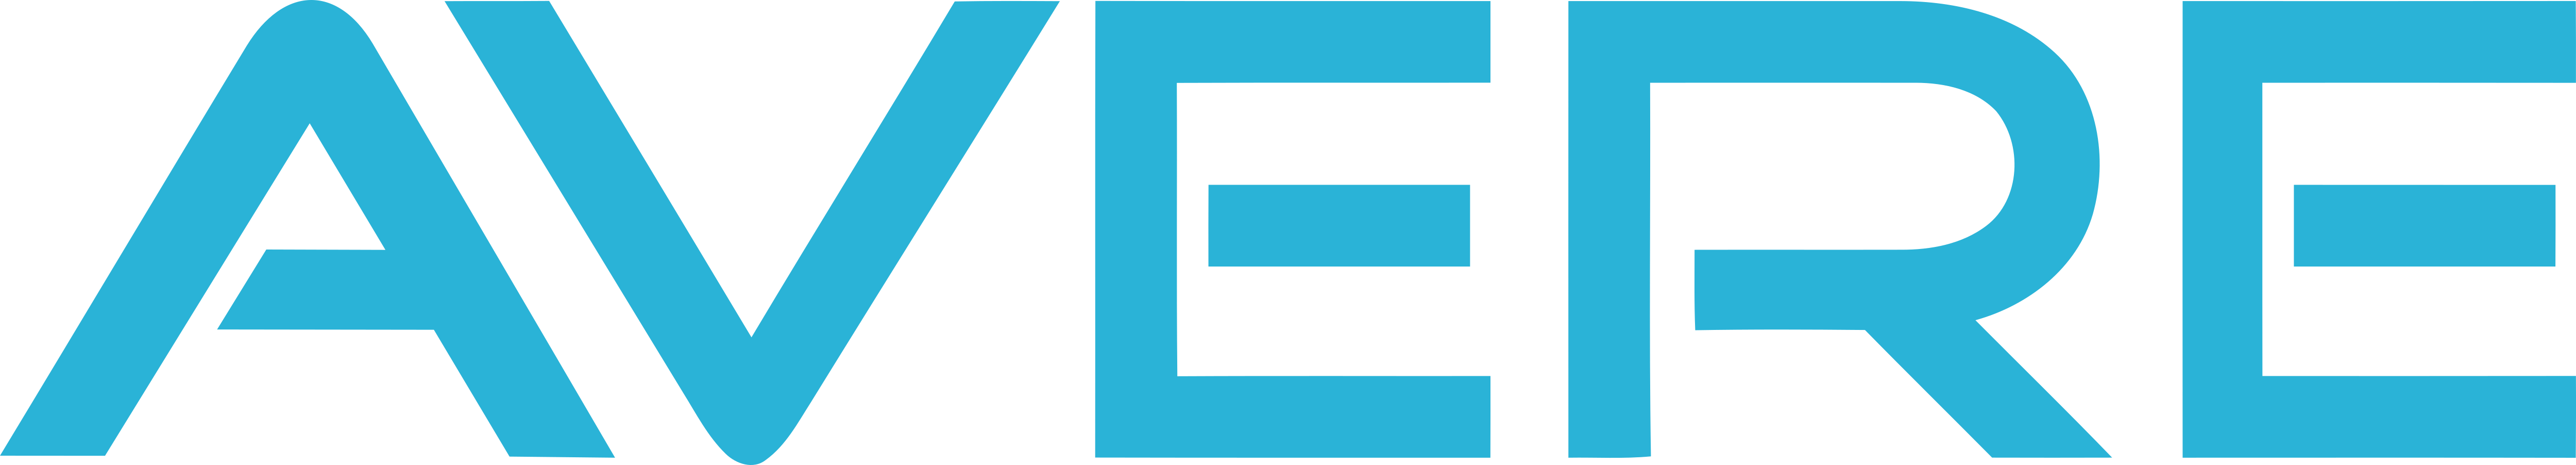 AVERE Logo png